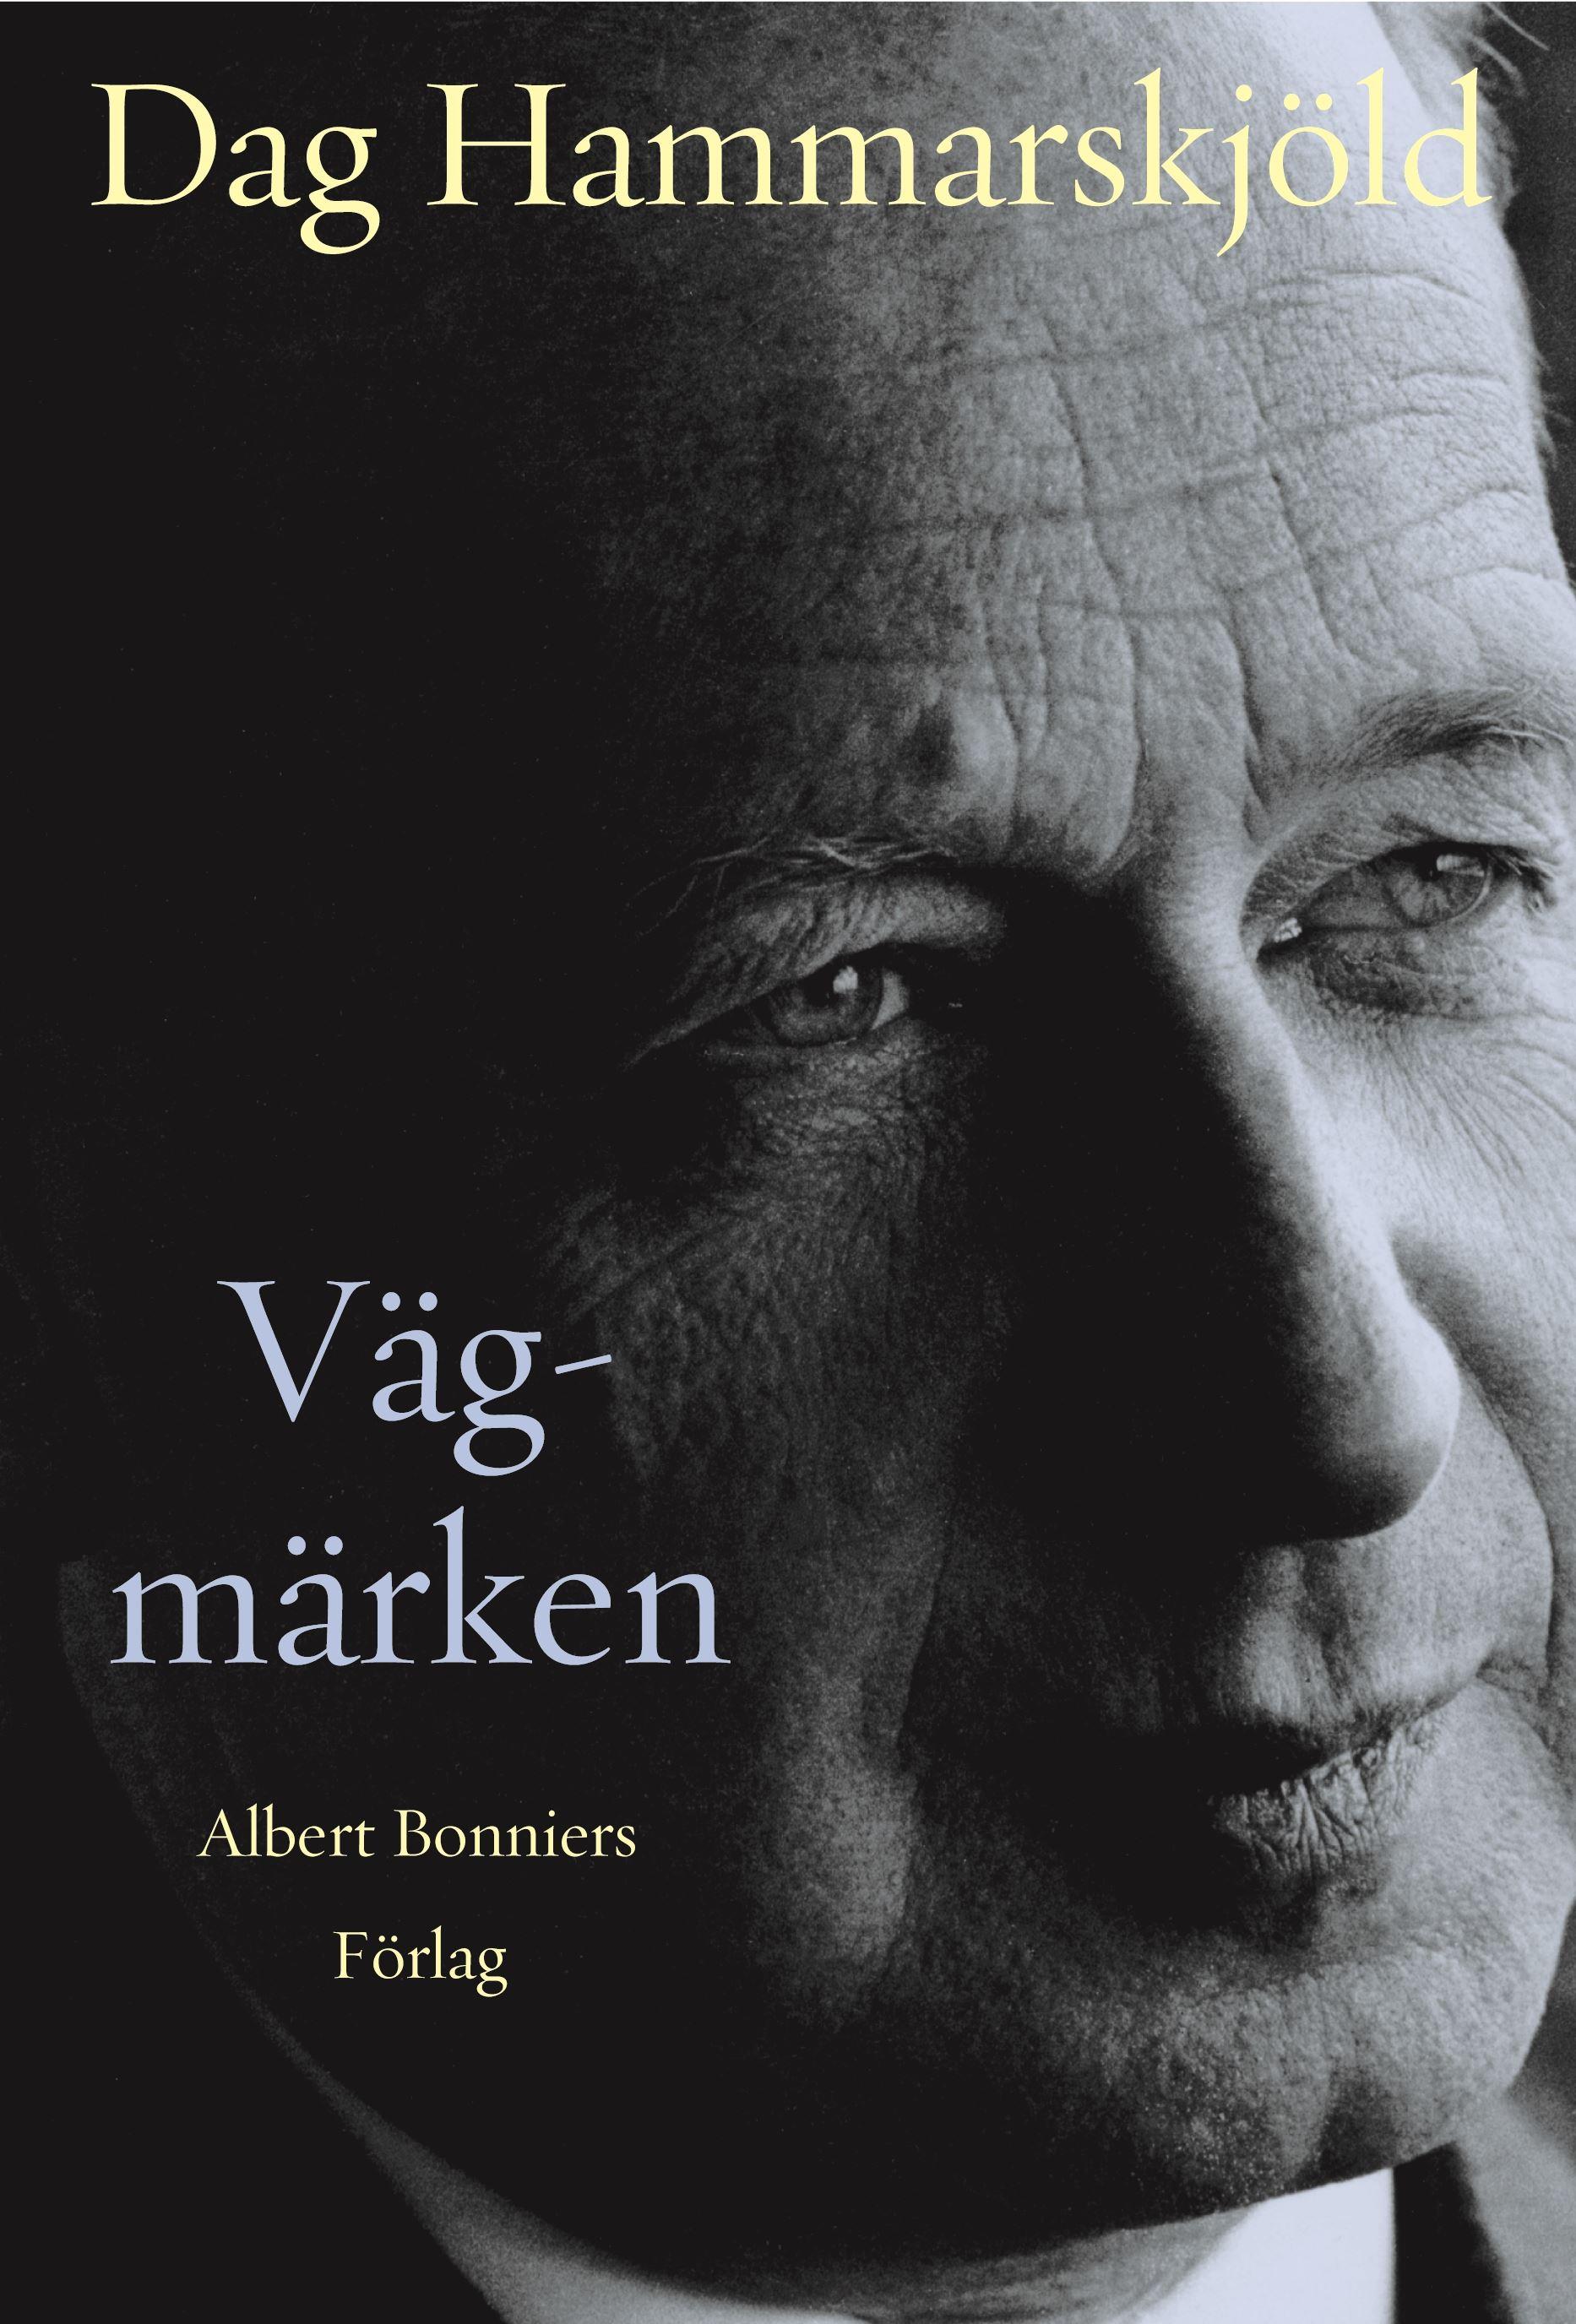 Bonniers,  © Bonniers, Dag Hammarskjöld